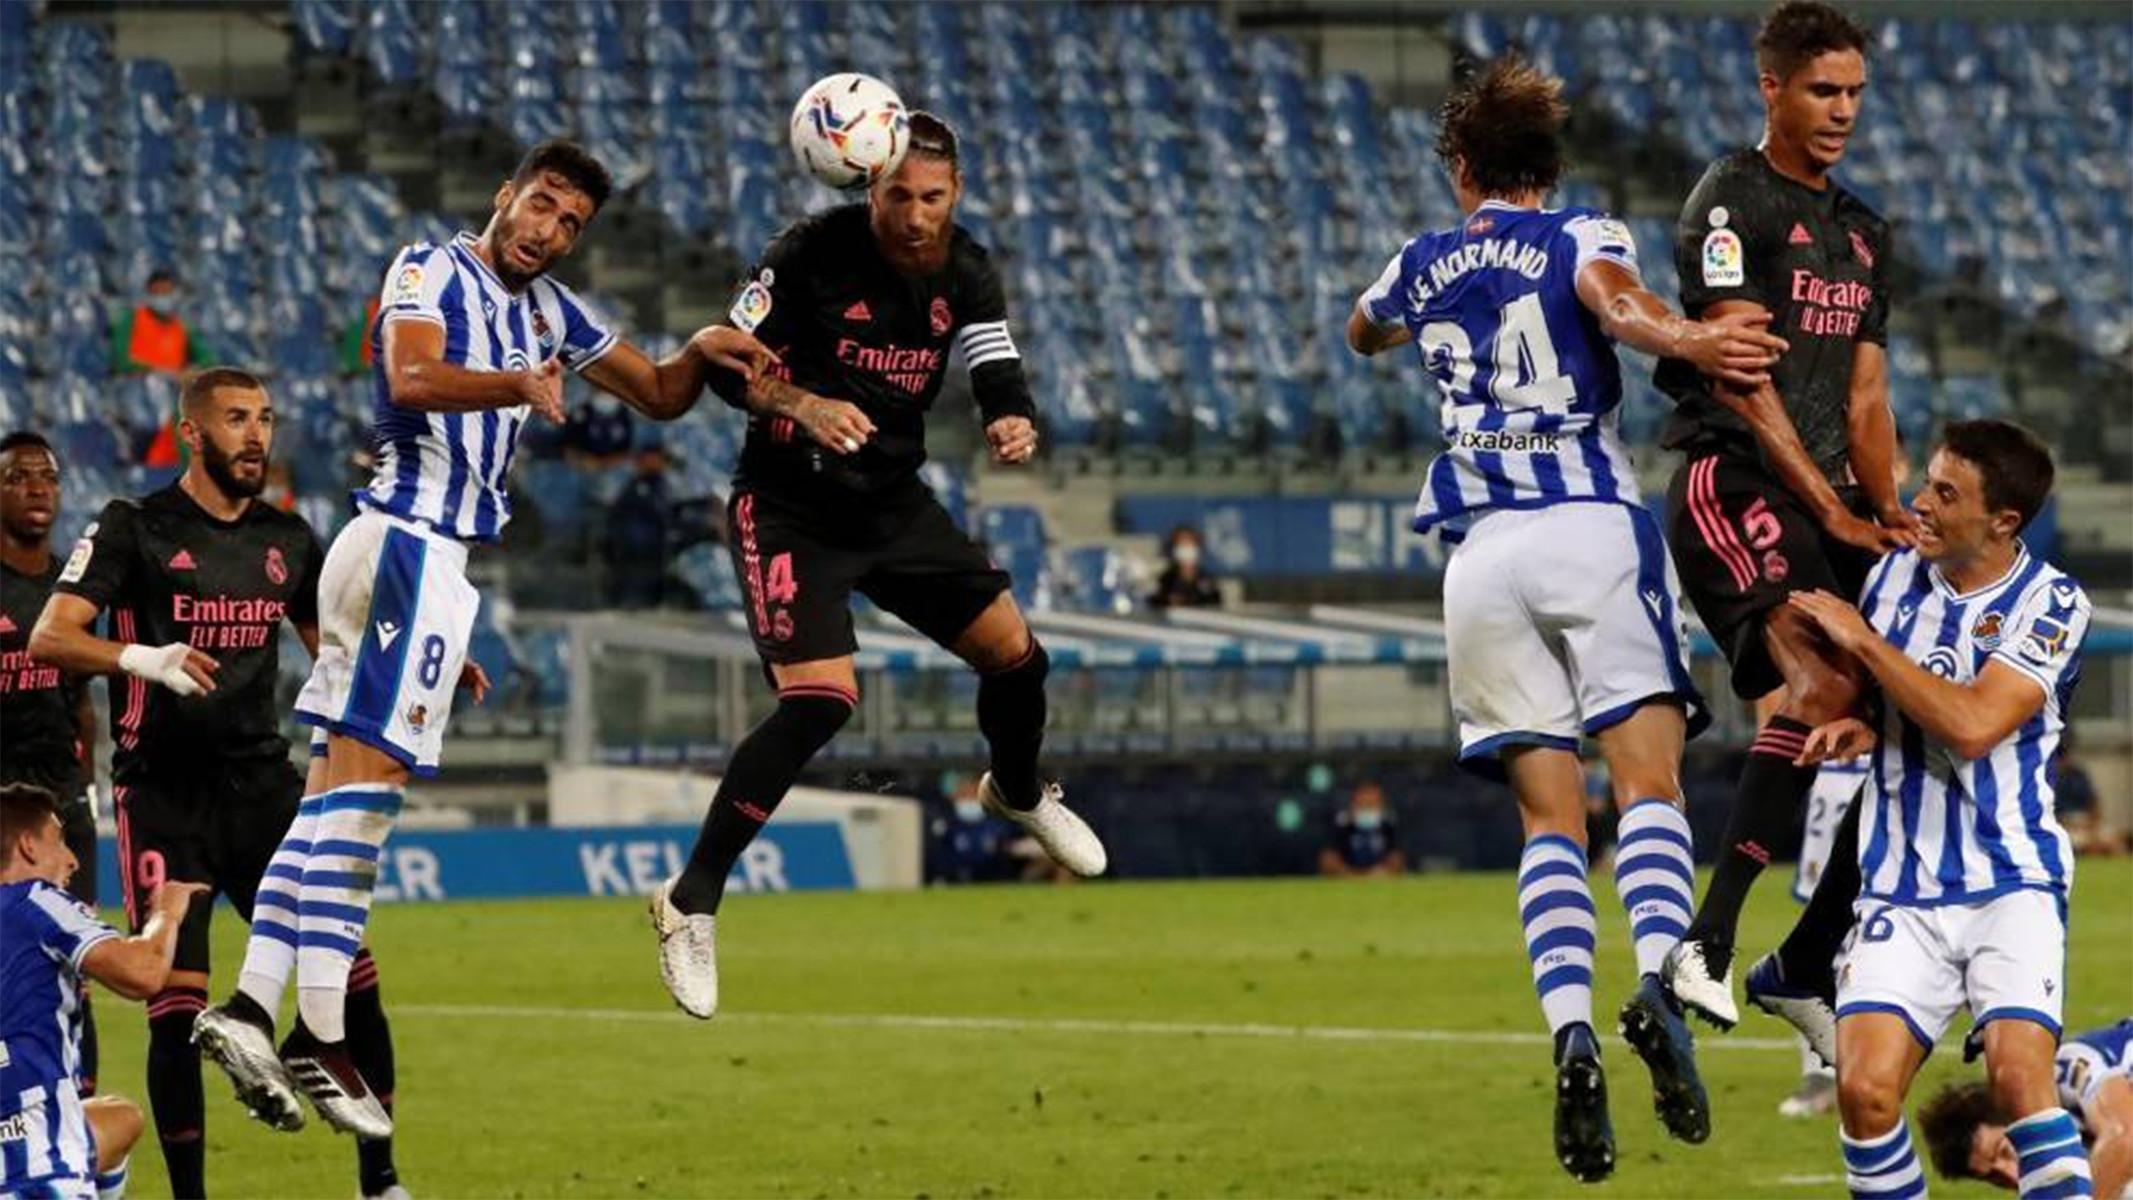 Real Madrid Mandul pada Laga Pertamanya di La Liga - JPNN.com